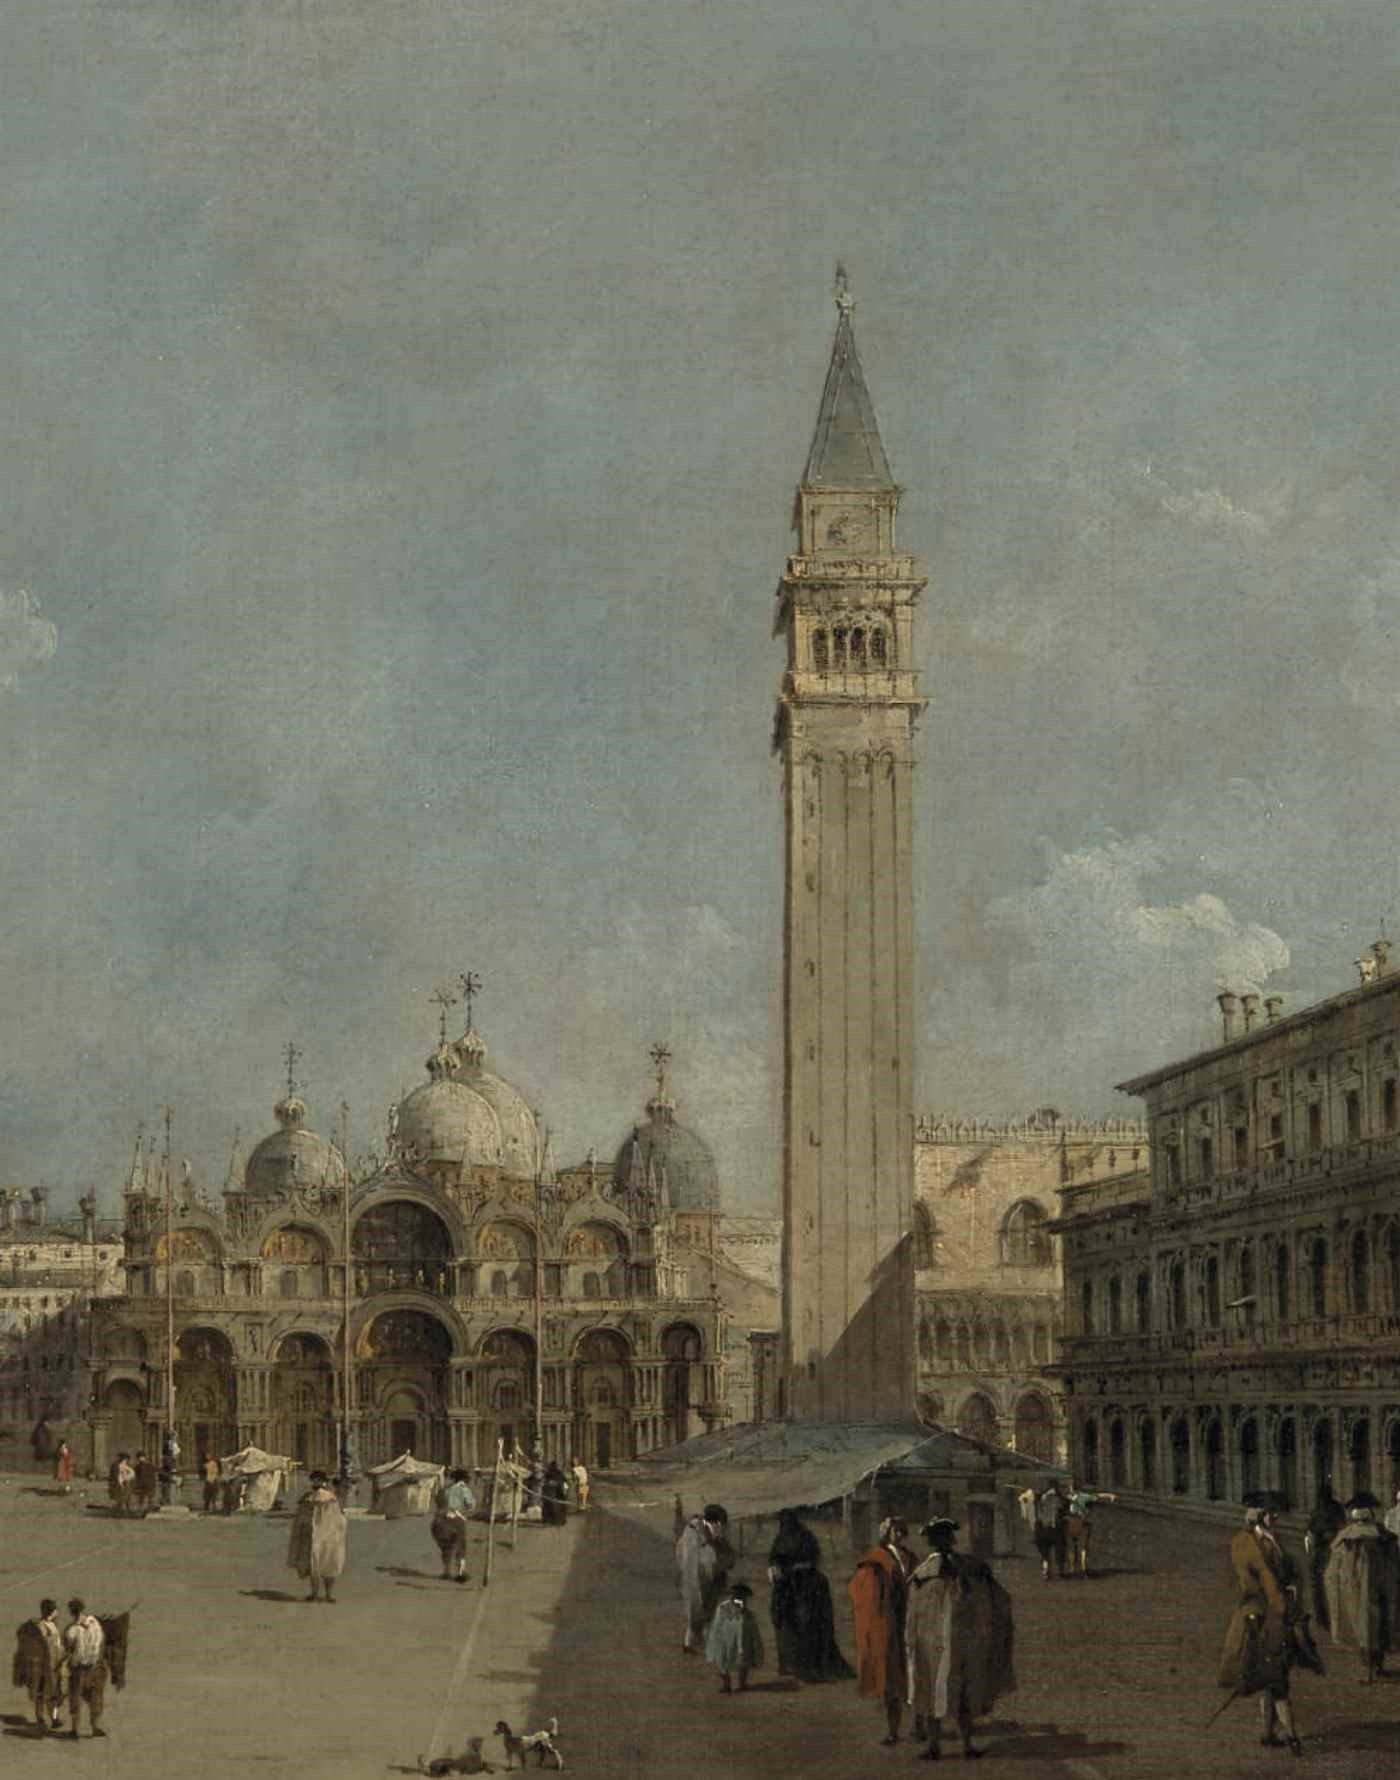 Une collection française: Pass auction at Christies